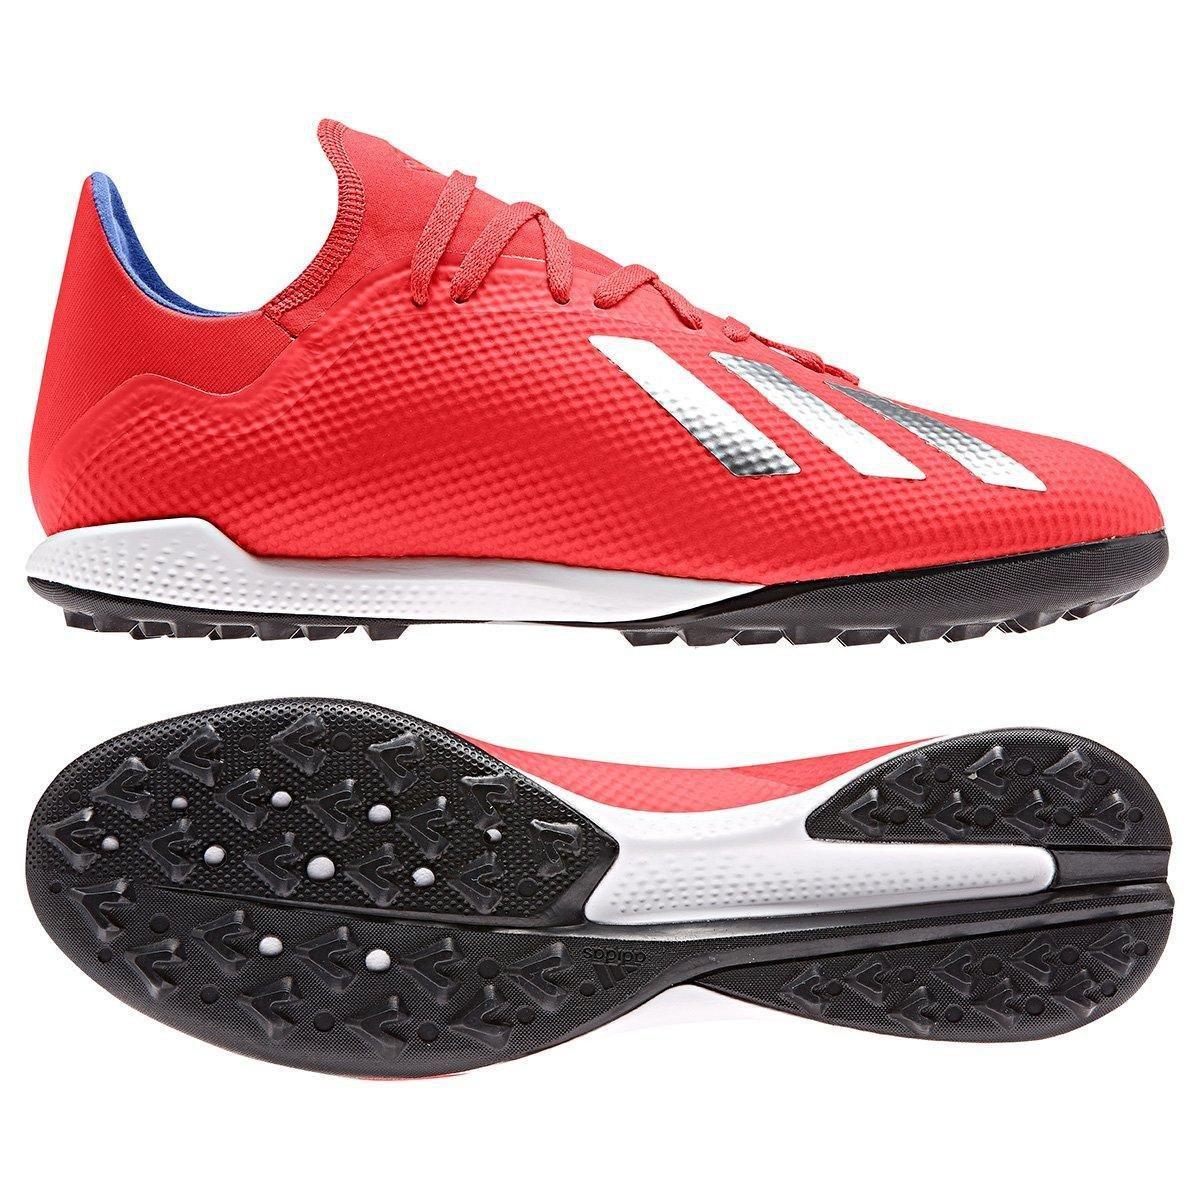 FornecedorNetshoes. Chuteira Society Adidas X 18 3 TF 37a12bf345265